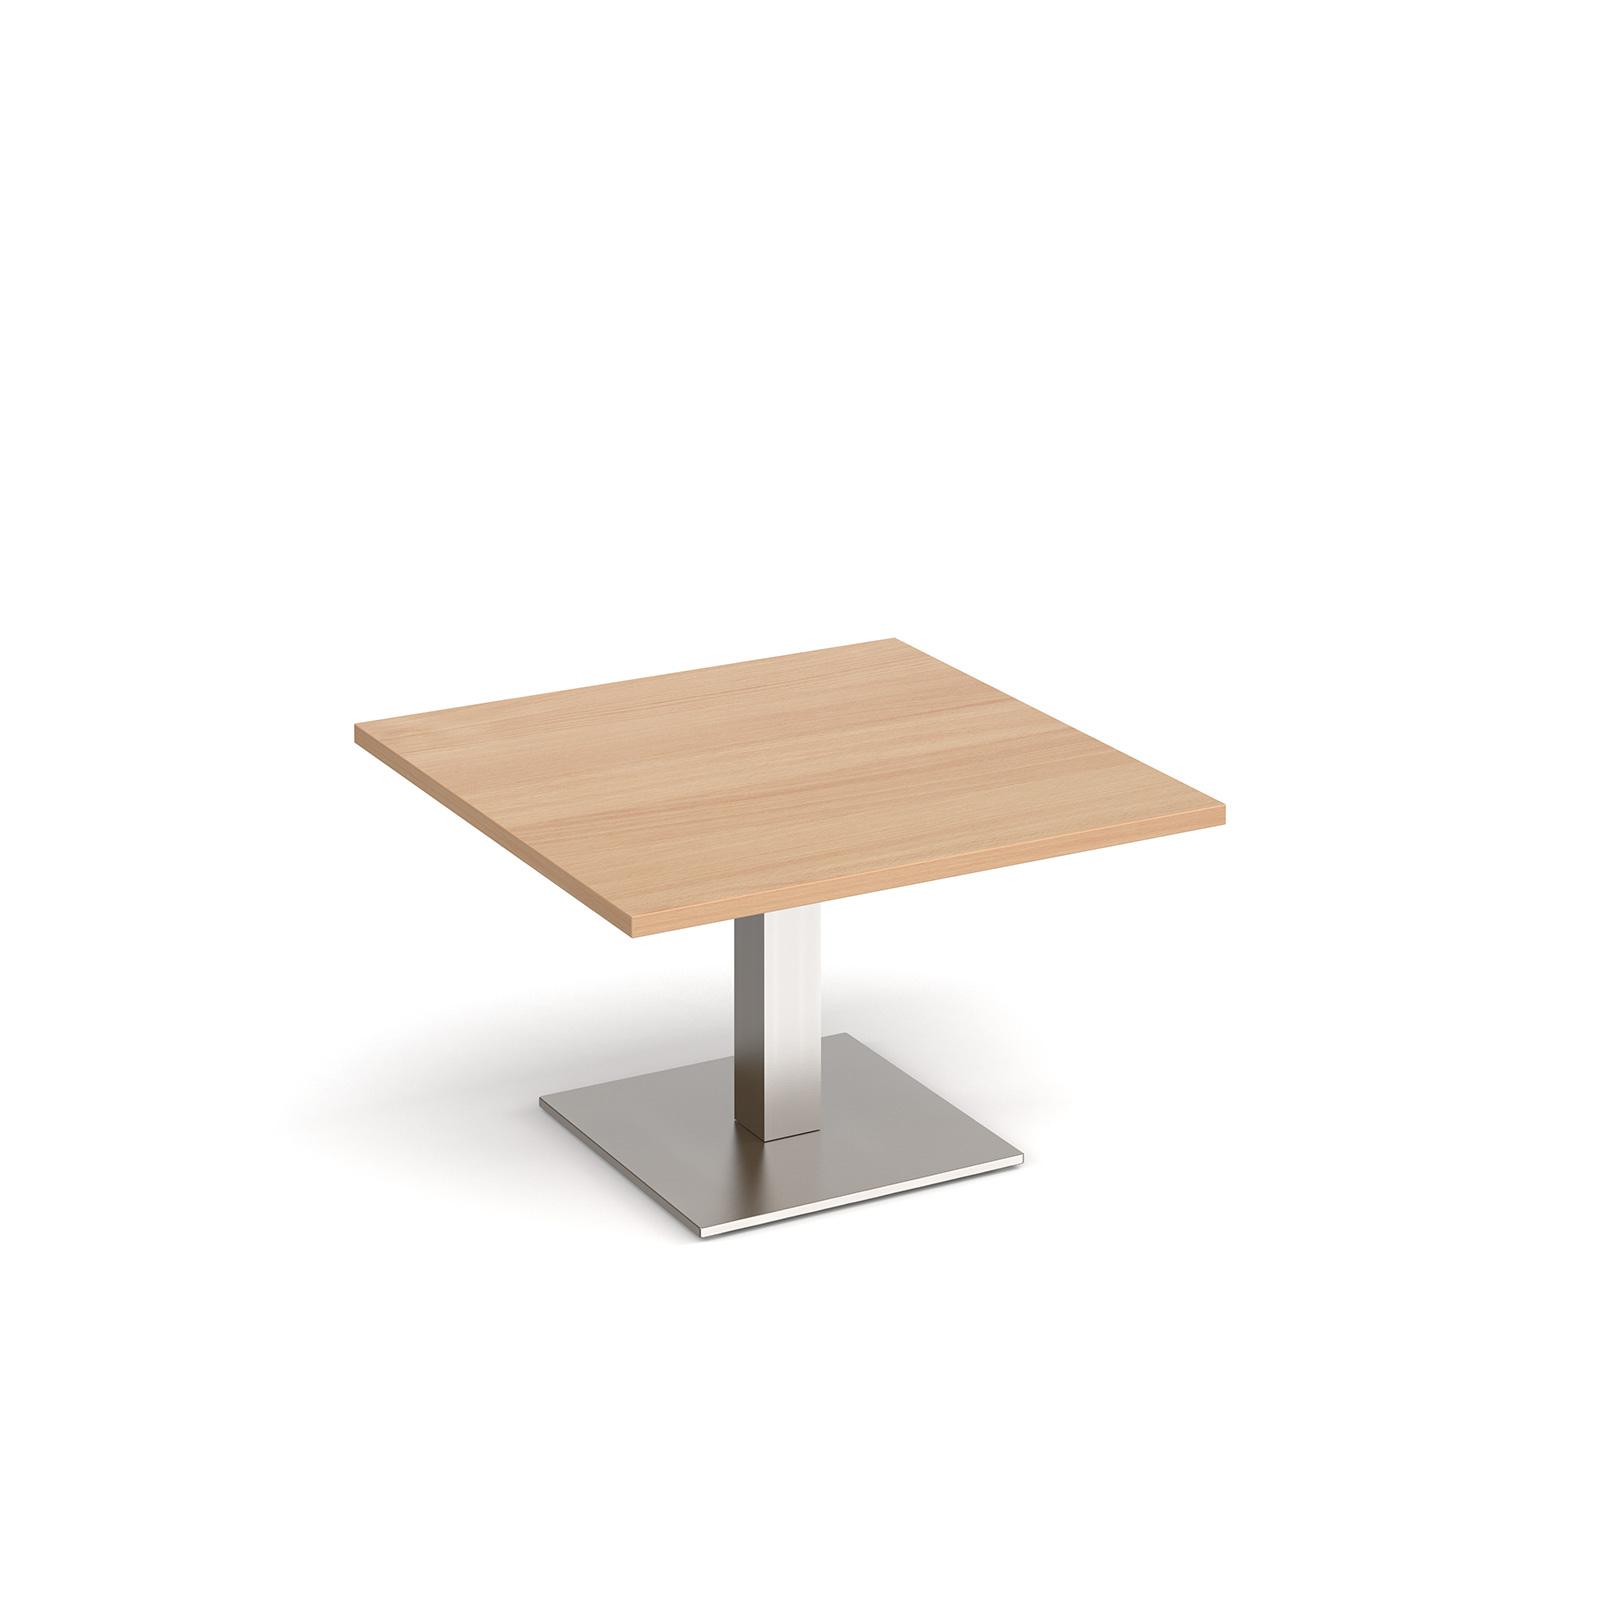 Coffee Brescia square coffee table with flat square base